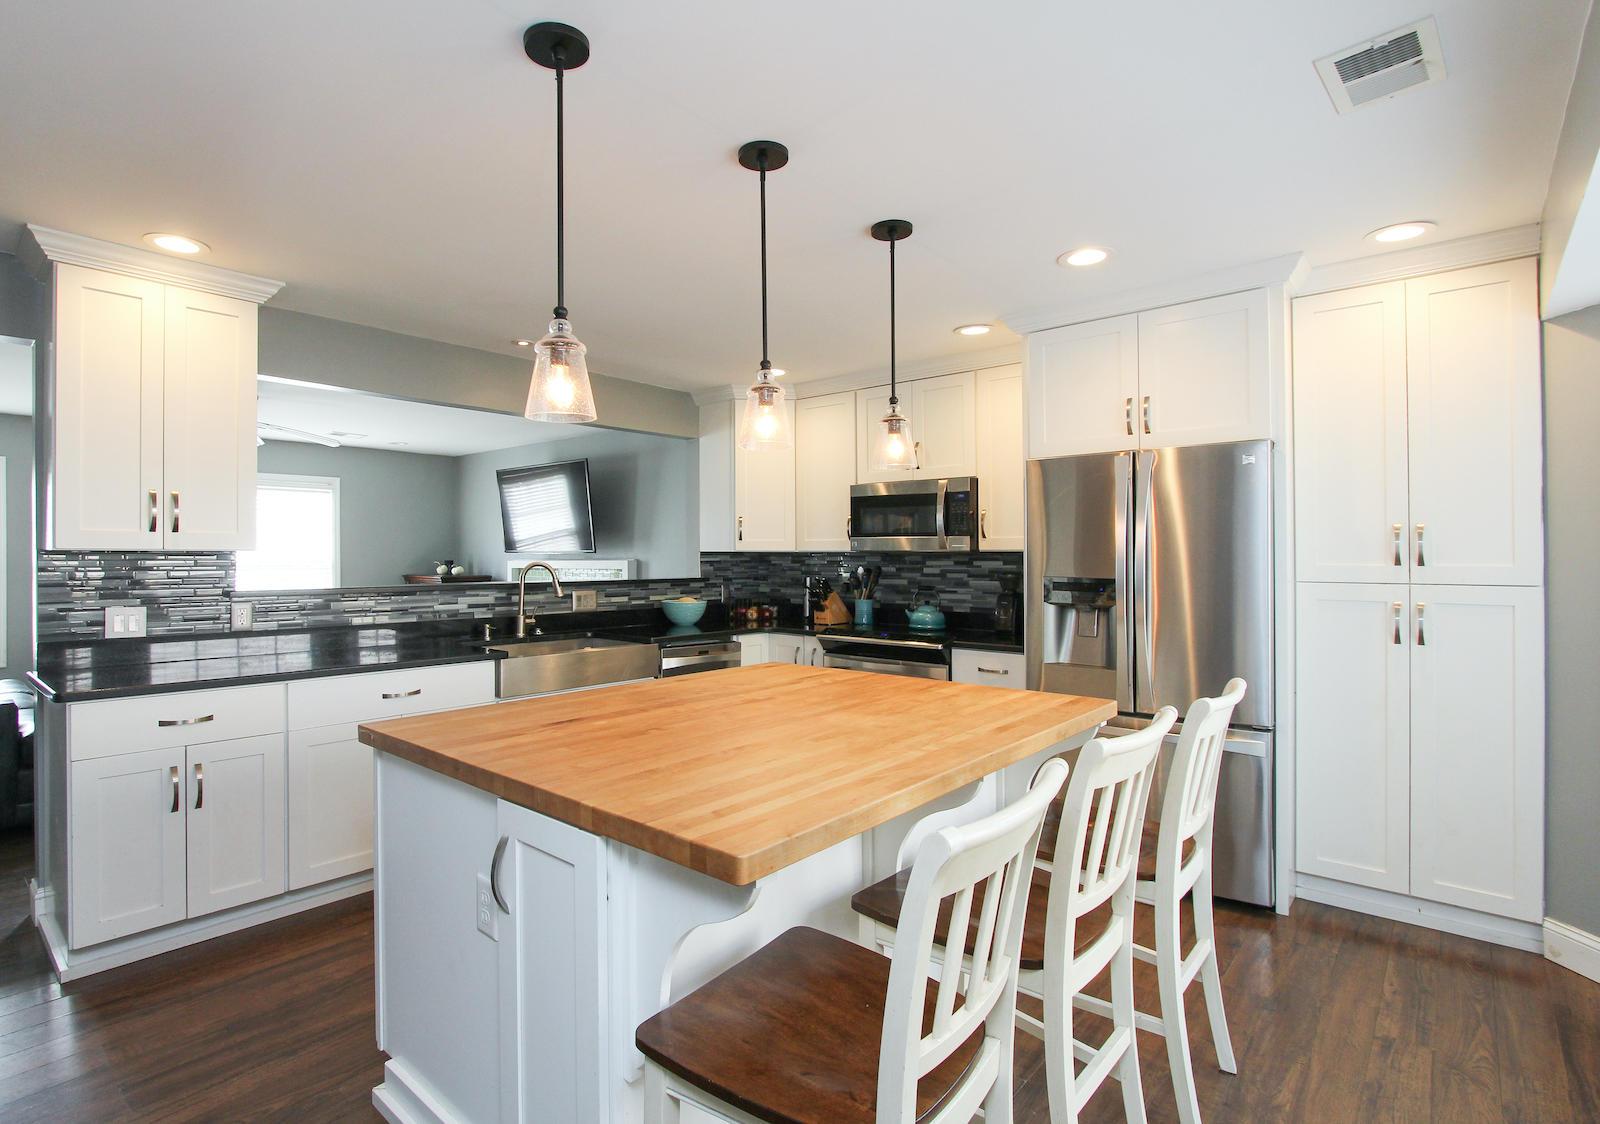 Landings Run Homes For Sale - 1548 Wickfield, Mount Pleasant, SC - 19